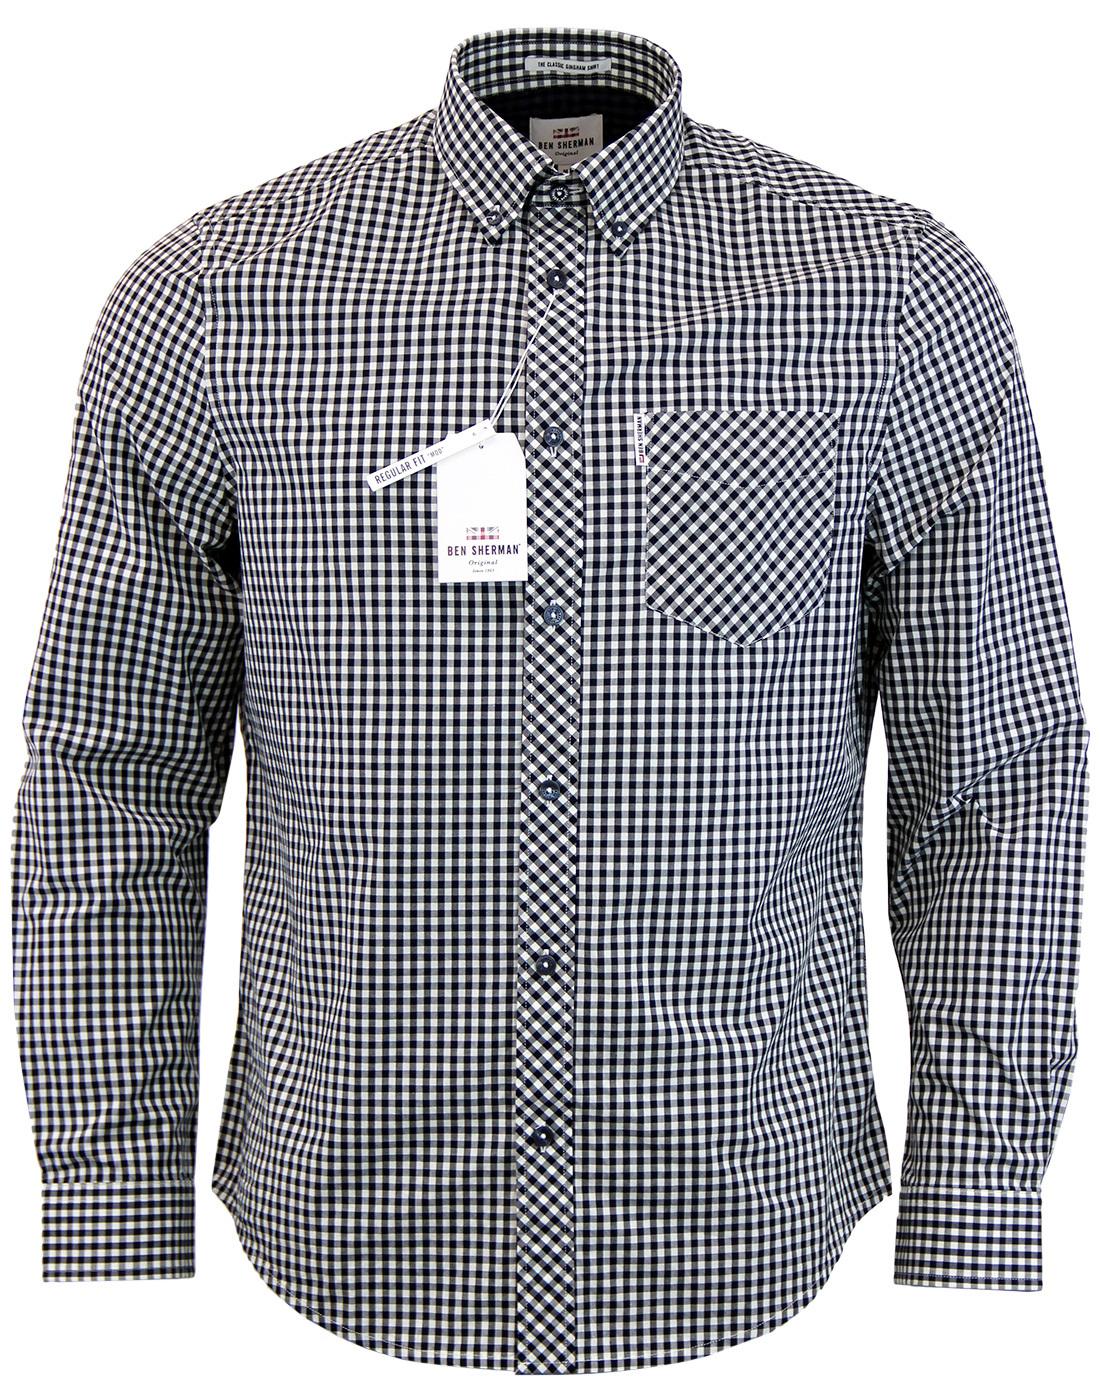 733919e39f BEN SHERMAN Mens Retro Mod 60s Gingham Shirt in Black